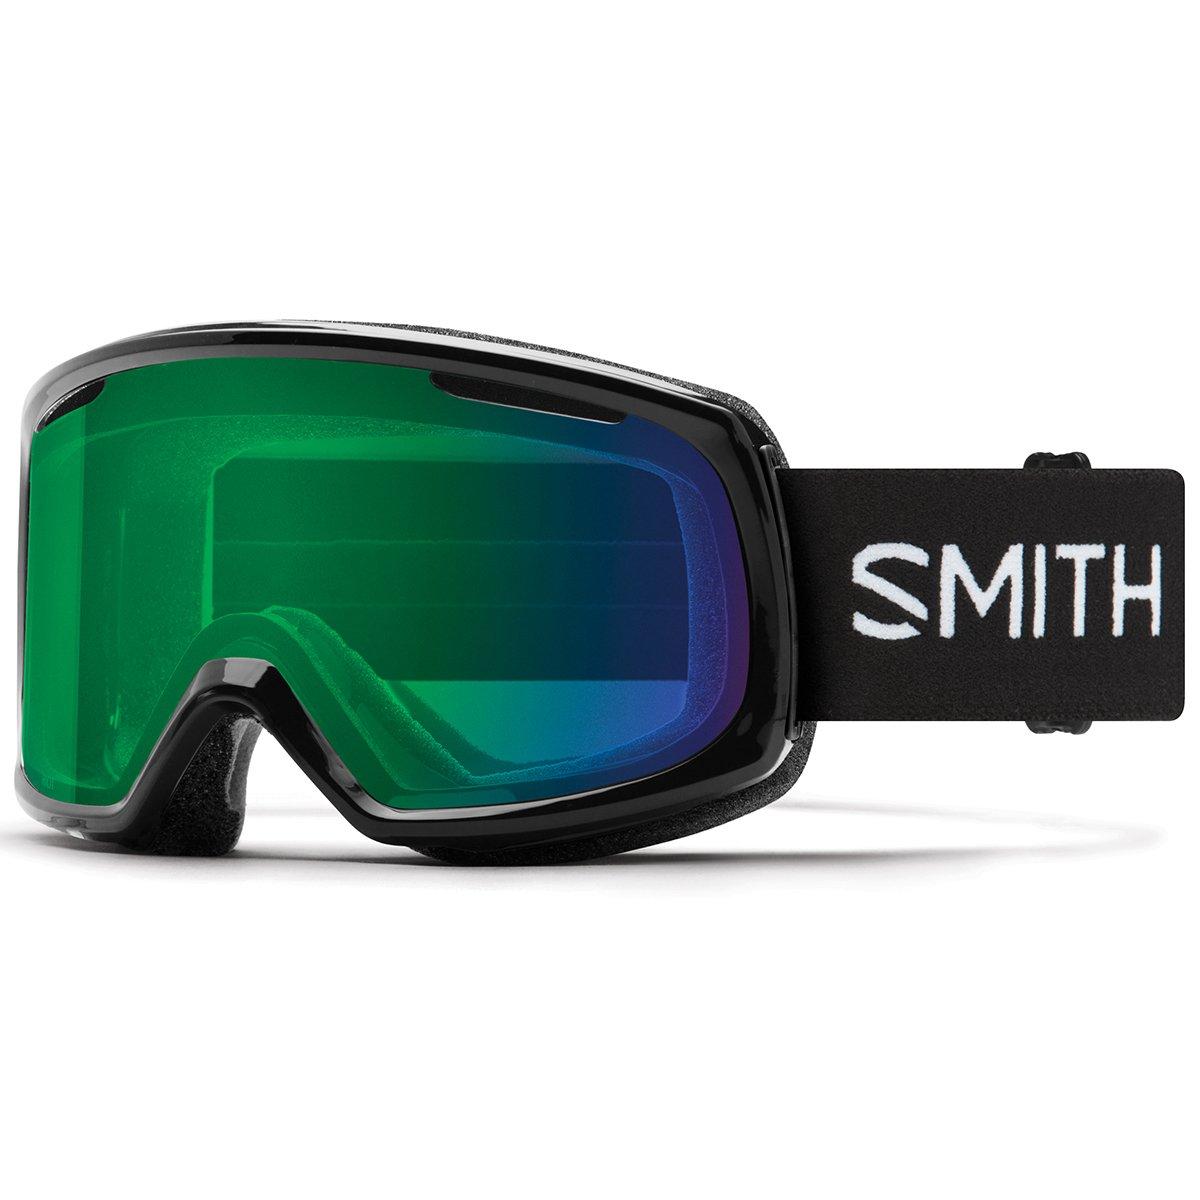 smith_riot_black_chromapop-everyday-violet-mirror.jpg